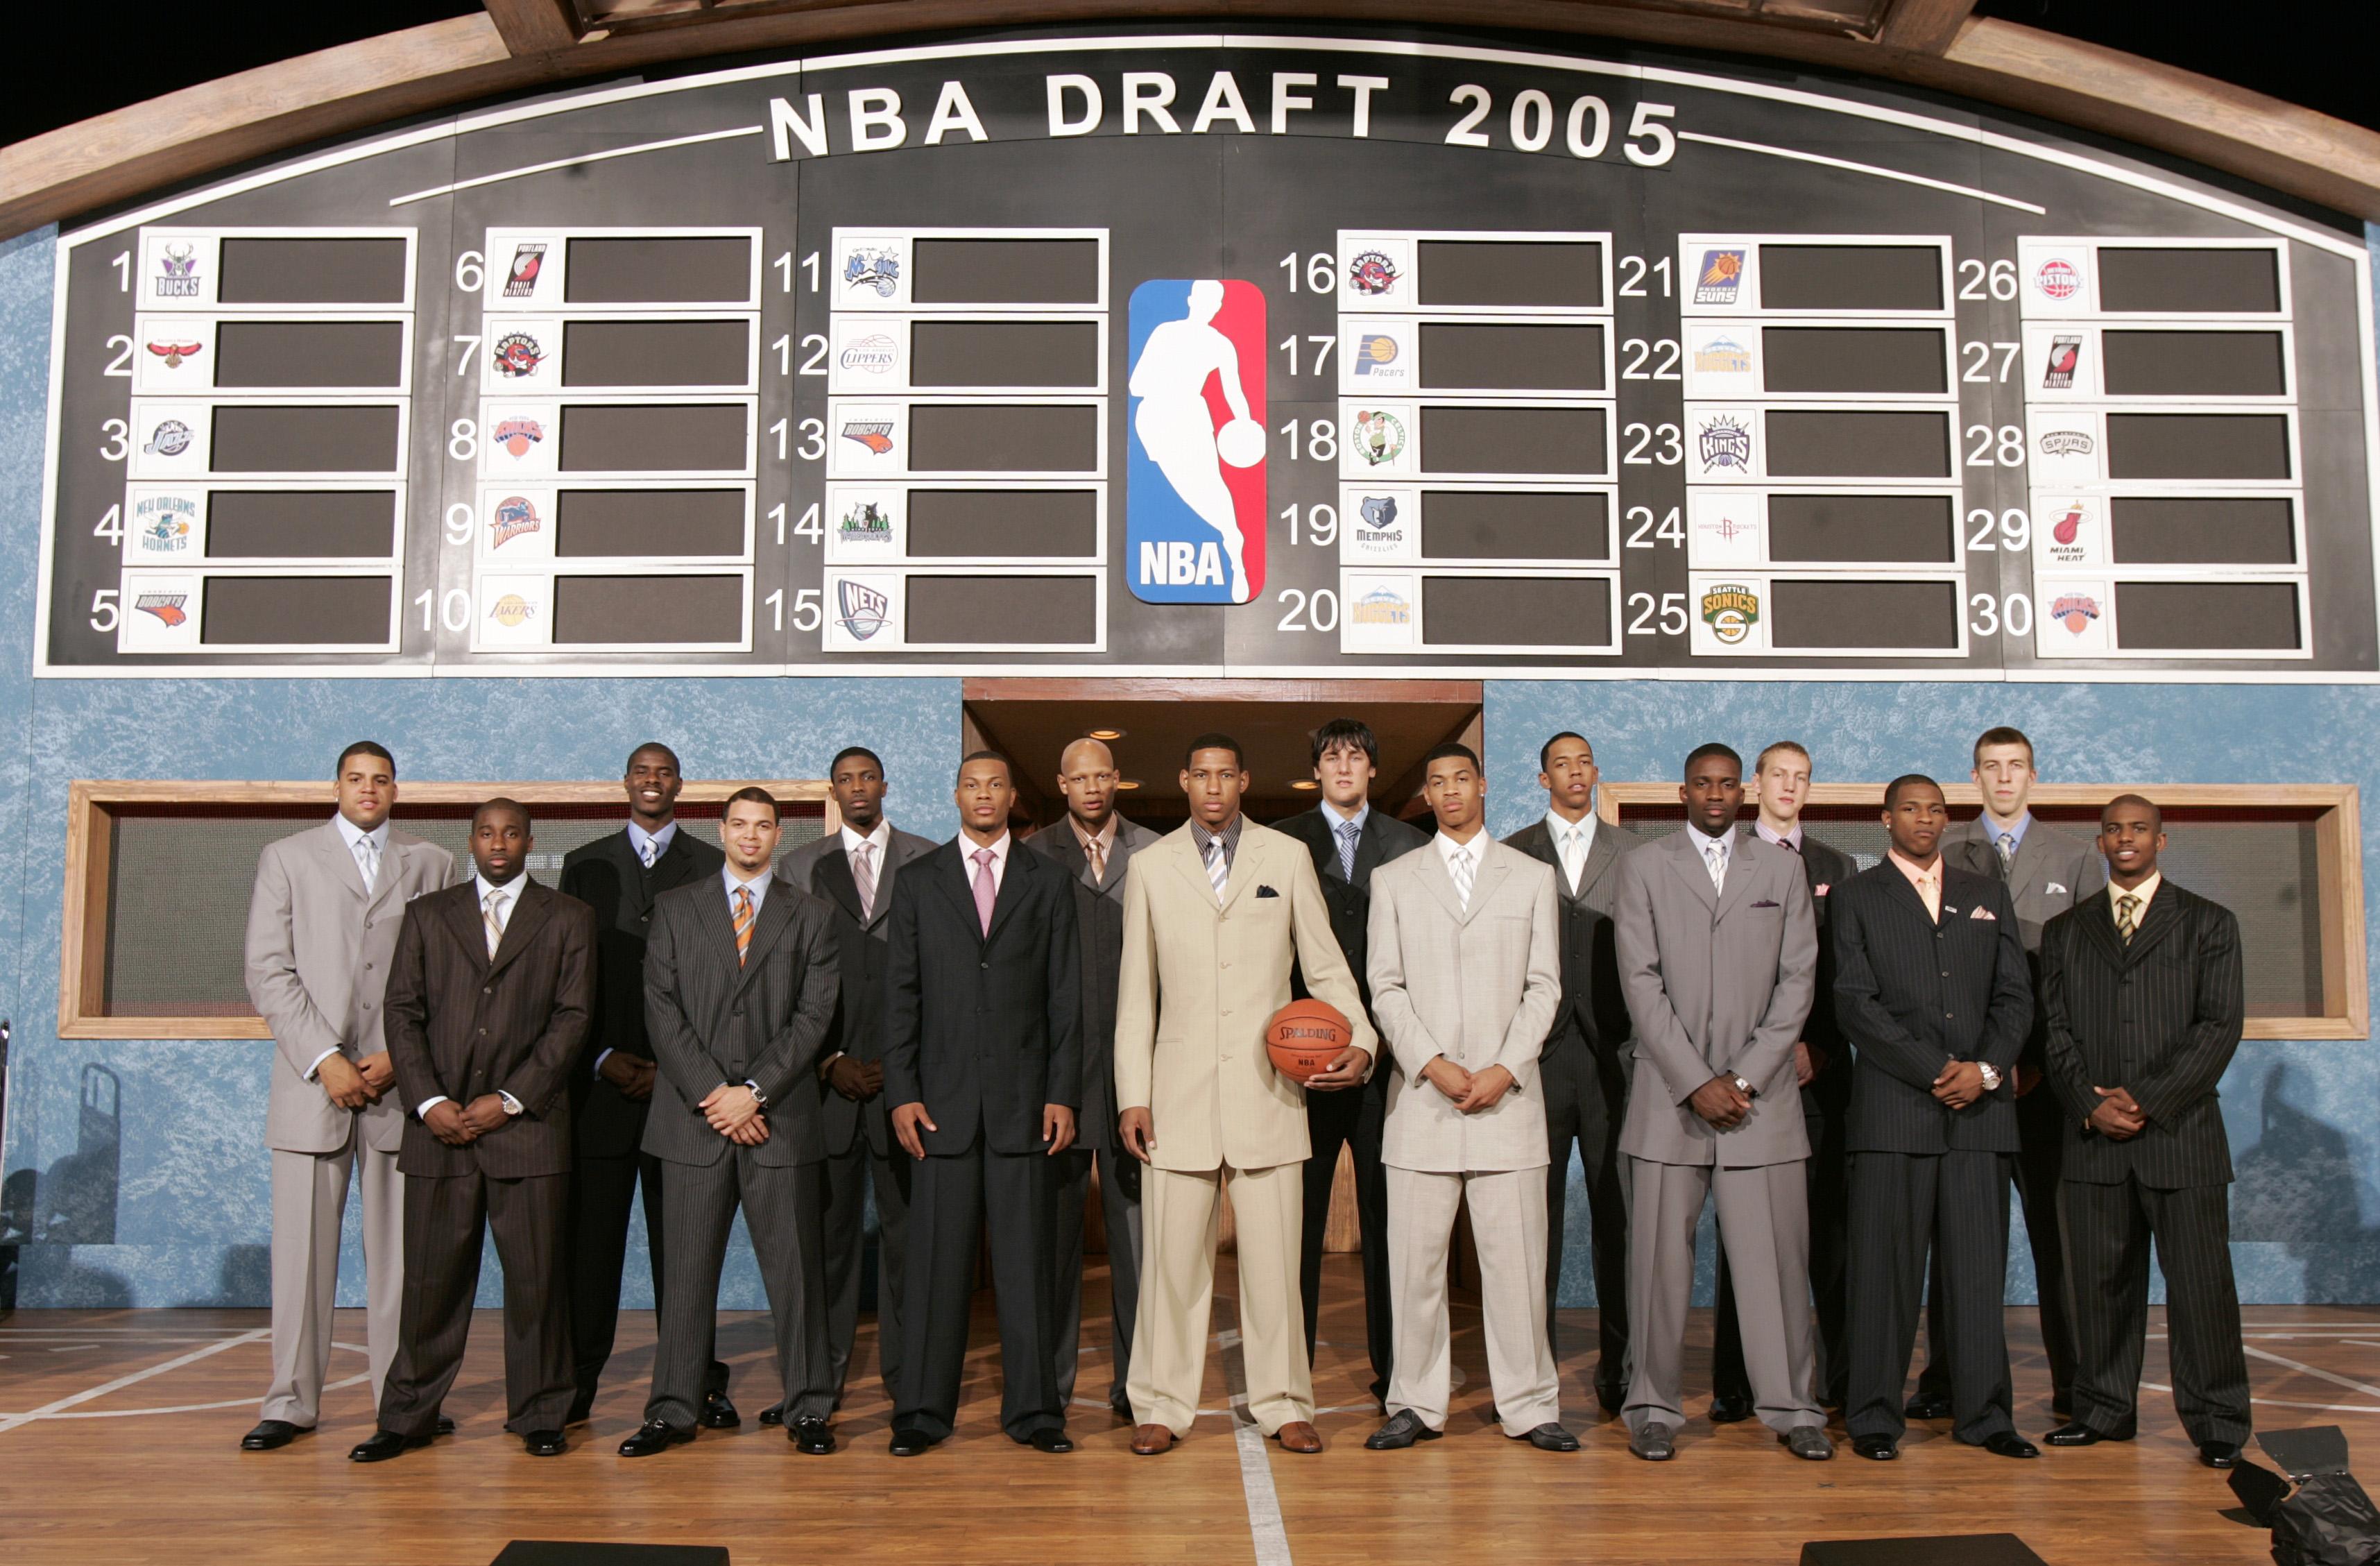 2005 NBA Draft